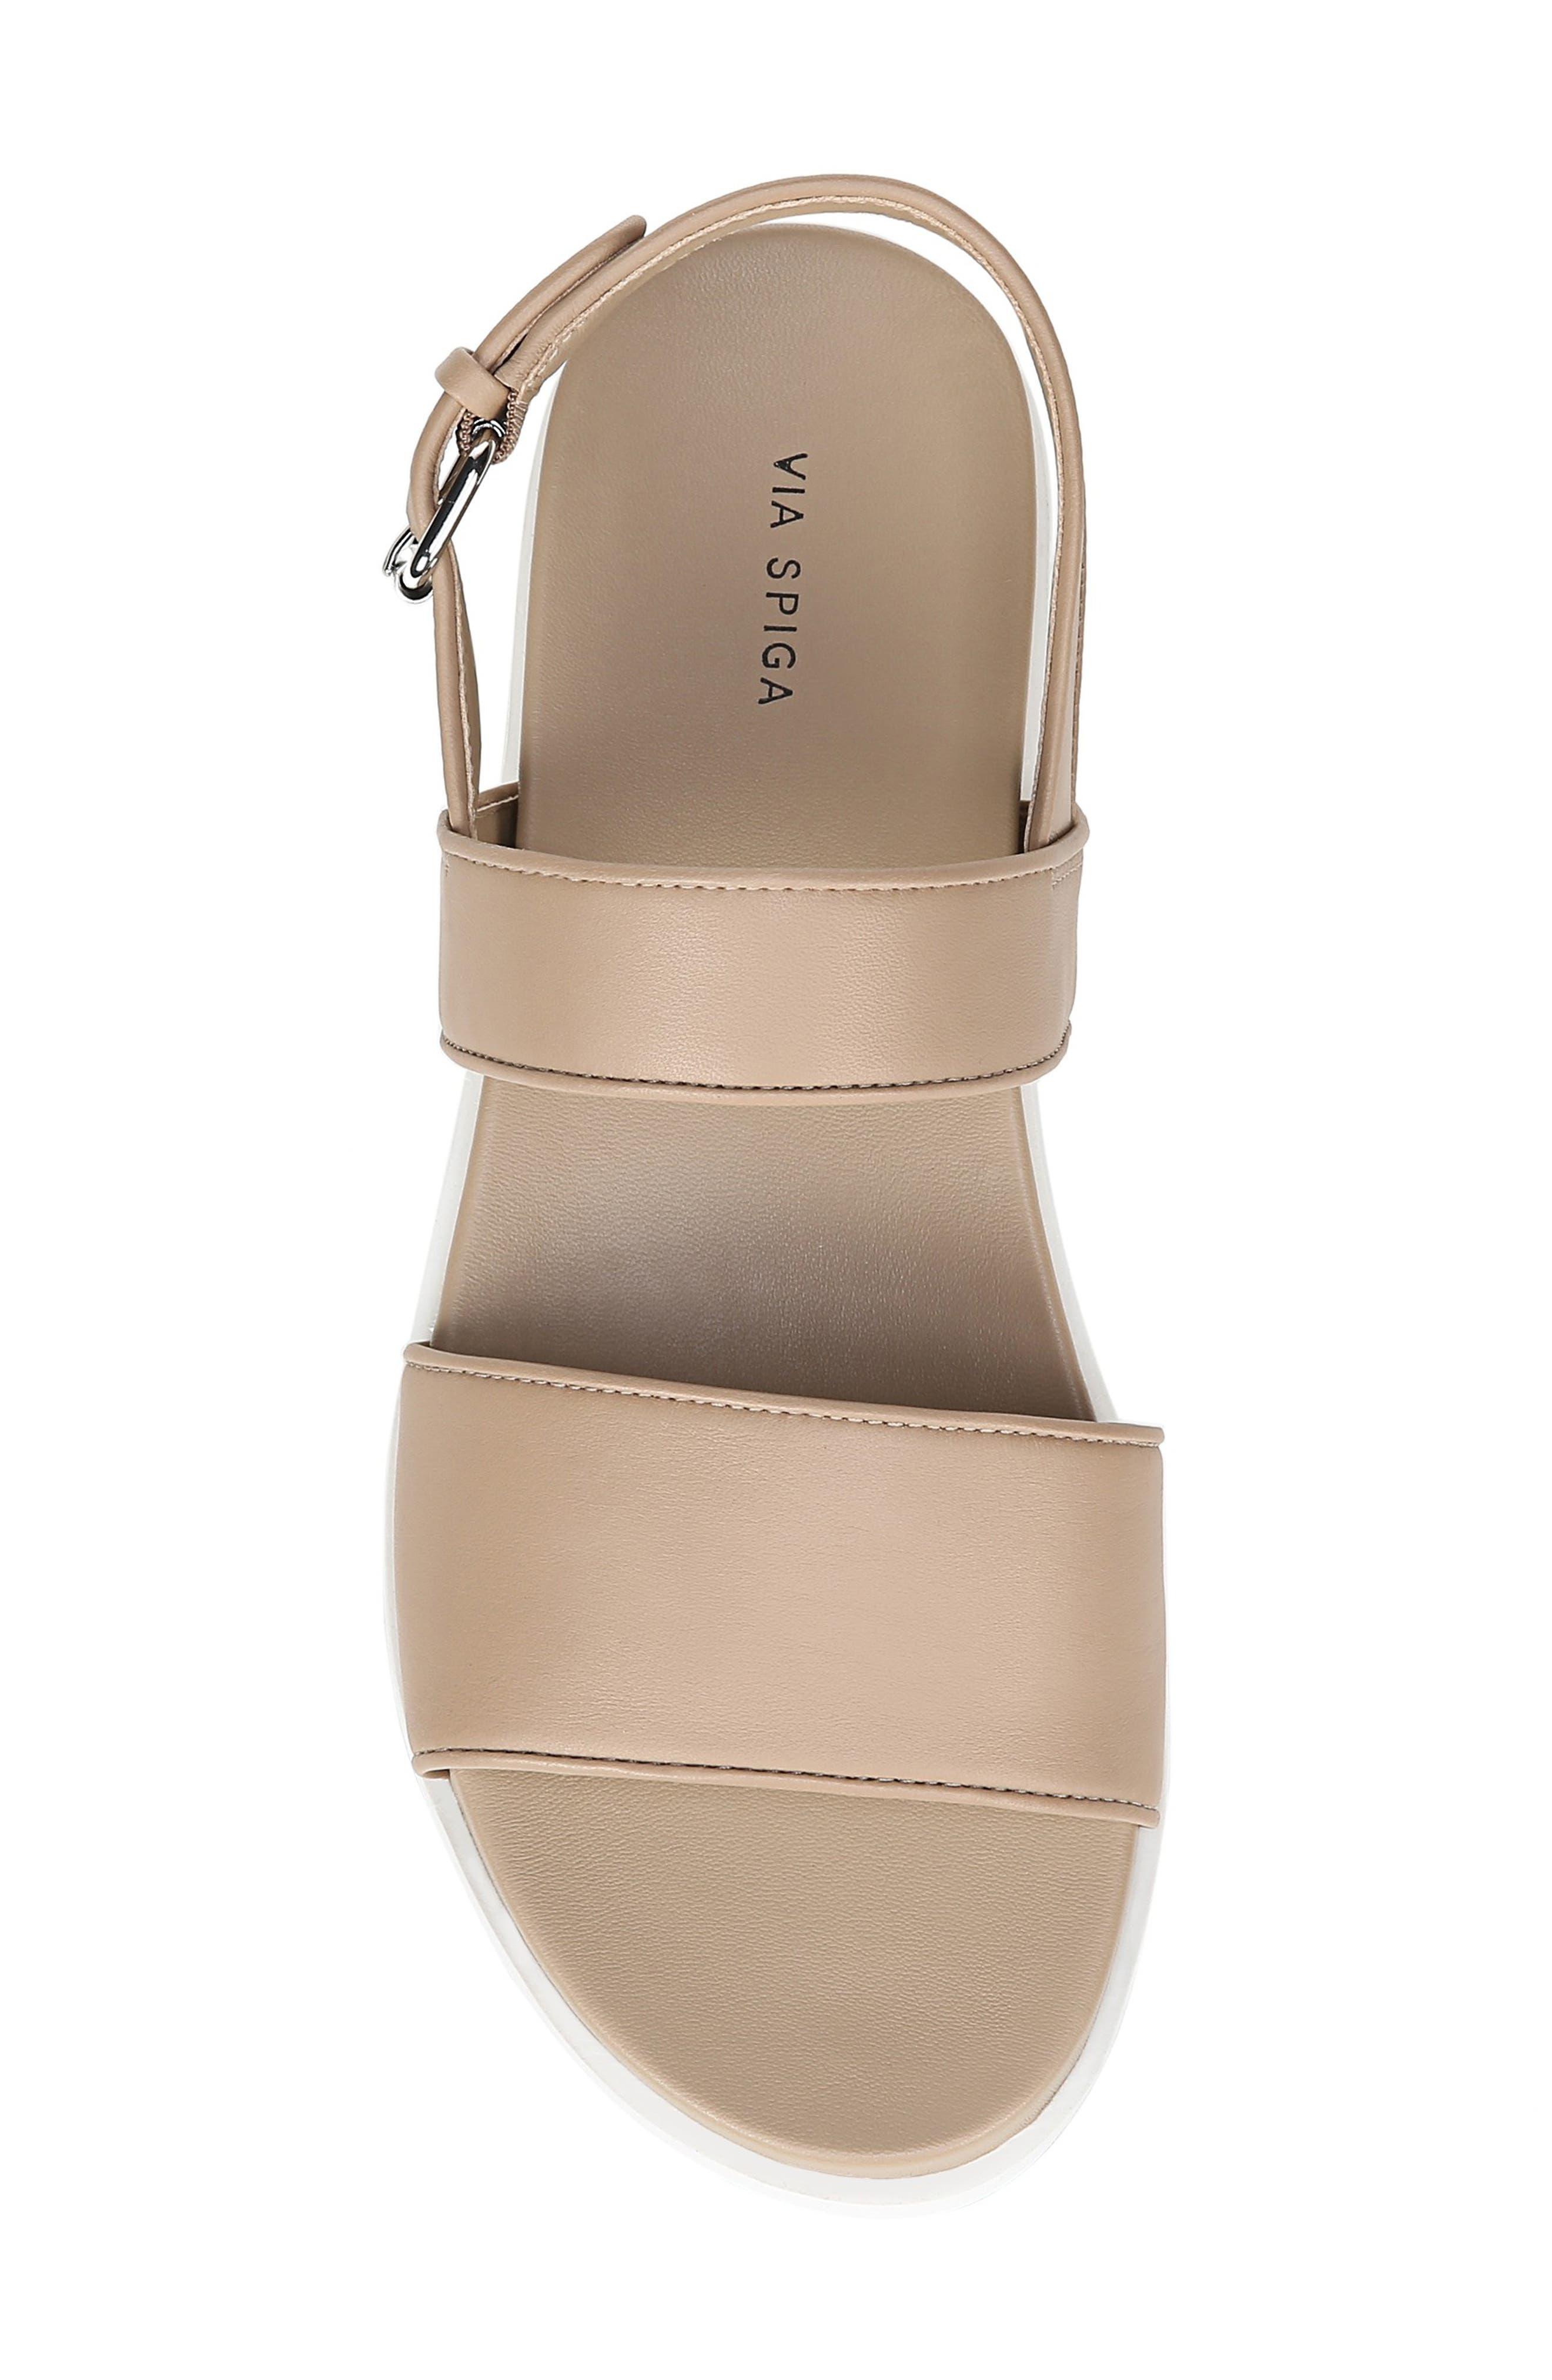 VIA SPIGA, Davi Platform Sandal, Alternate thumbnail 5, color, DESERT NAPPA